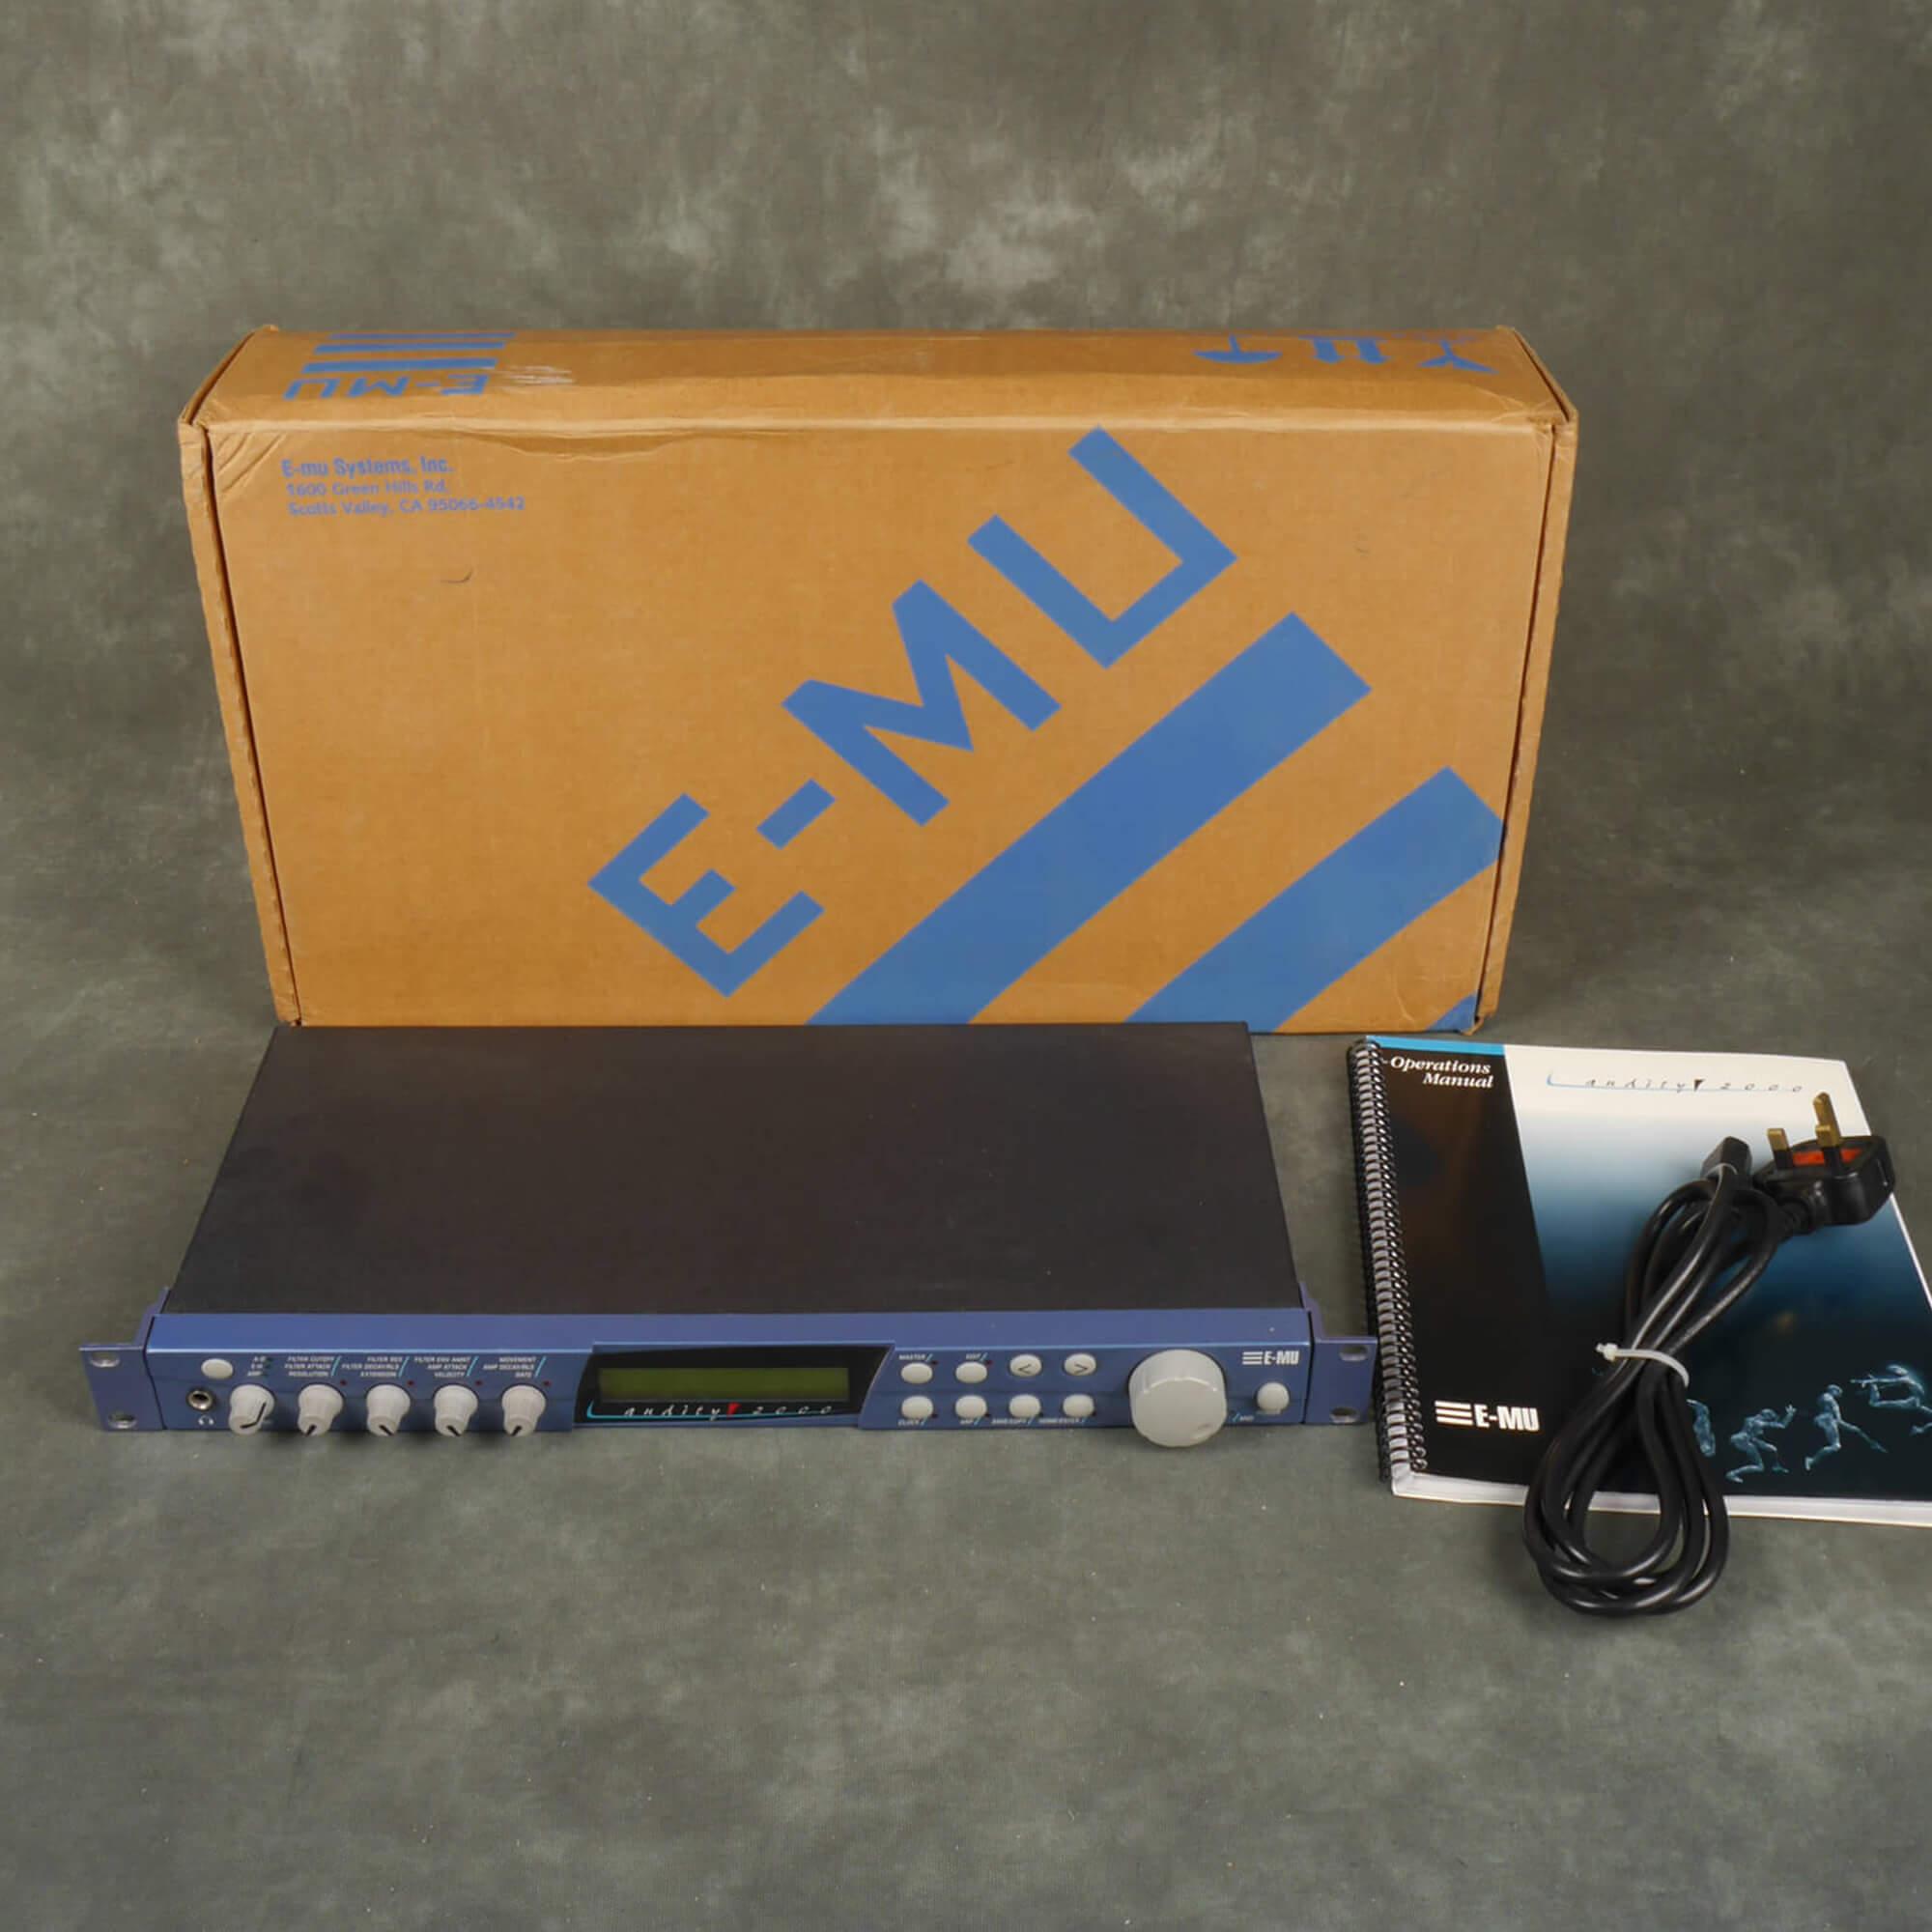 EMU Audity 2000 Sound Module w/Box - 2nd Hand